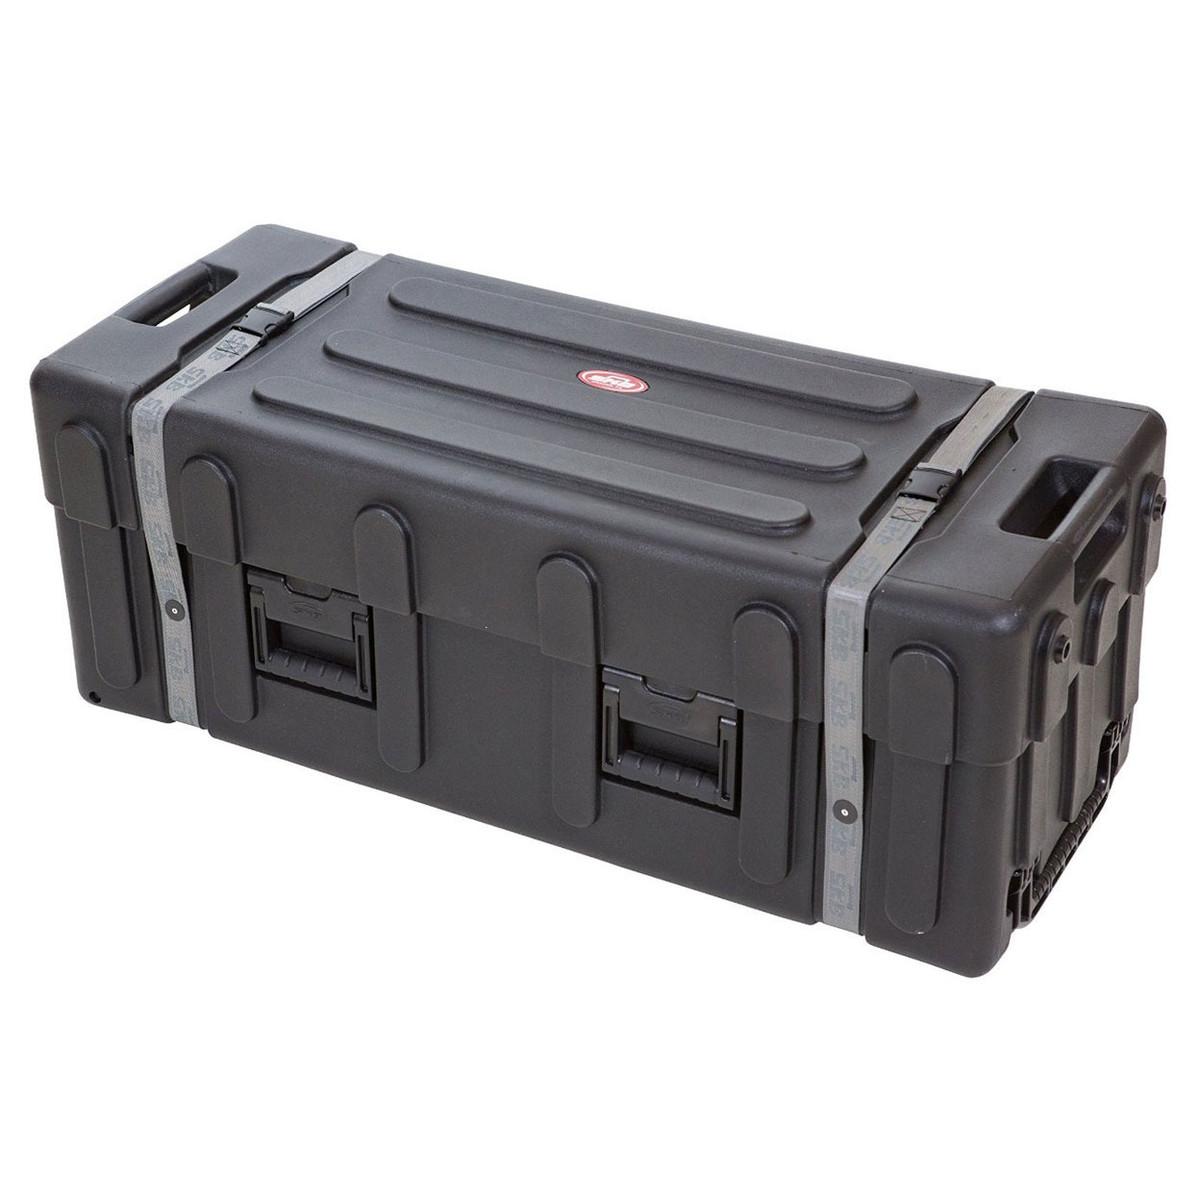 skb large drum hardware case with wheels at gear4music. Black Bedroom Furniture Sets. Home Design Ideas